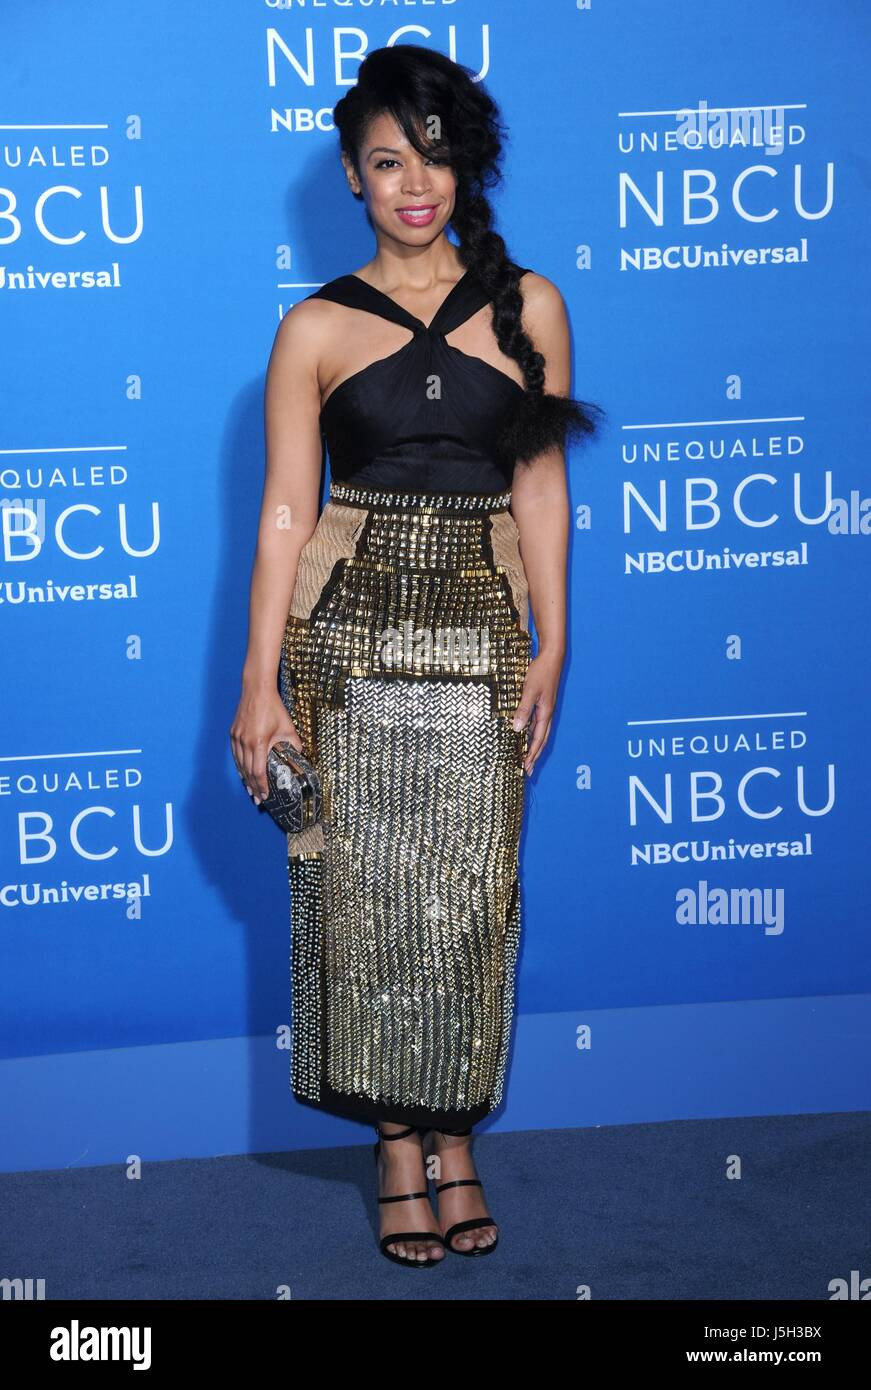 Susan Kelechi Watson at arrivals for 2017 NBCUniversal Upfront Presentation, Radio City Music Hall, New York, NY Stock Photo